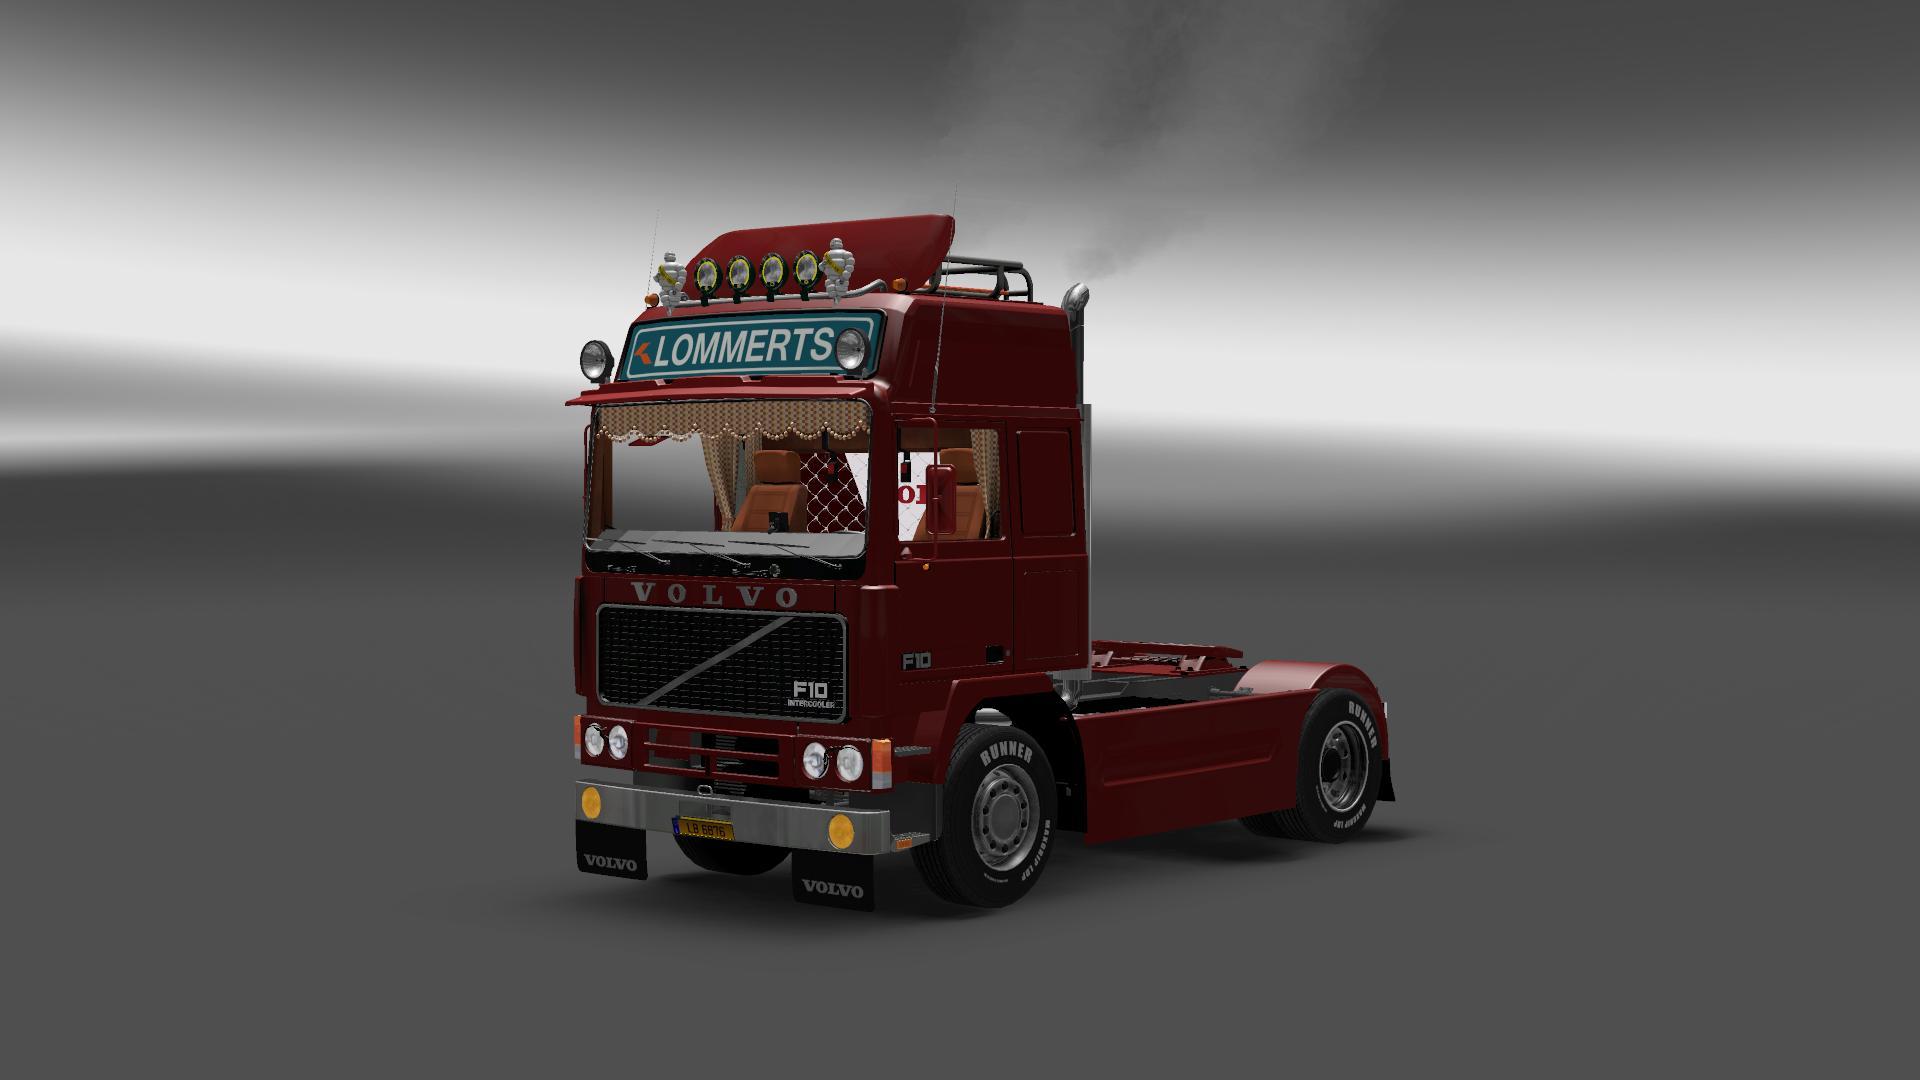 Volvo Truck Parts >> VOLVO F10 8X4 PBA V FINAL ETS2 -Euro Truck Simulator 2 Mods